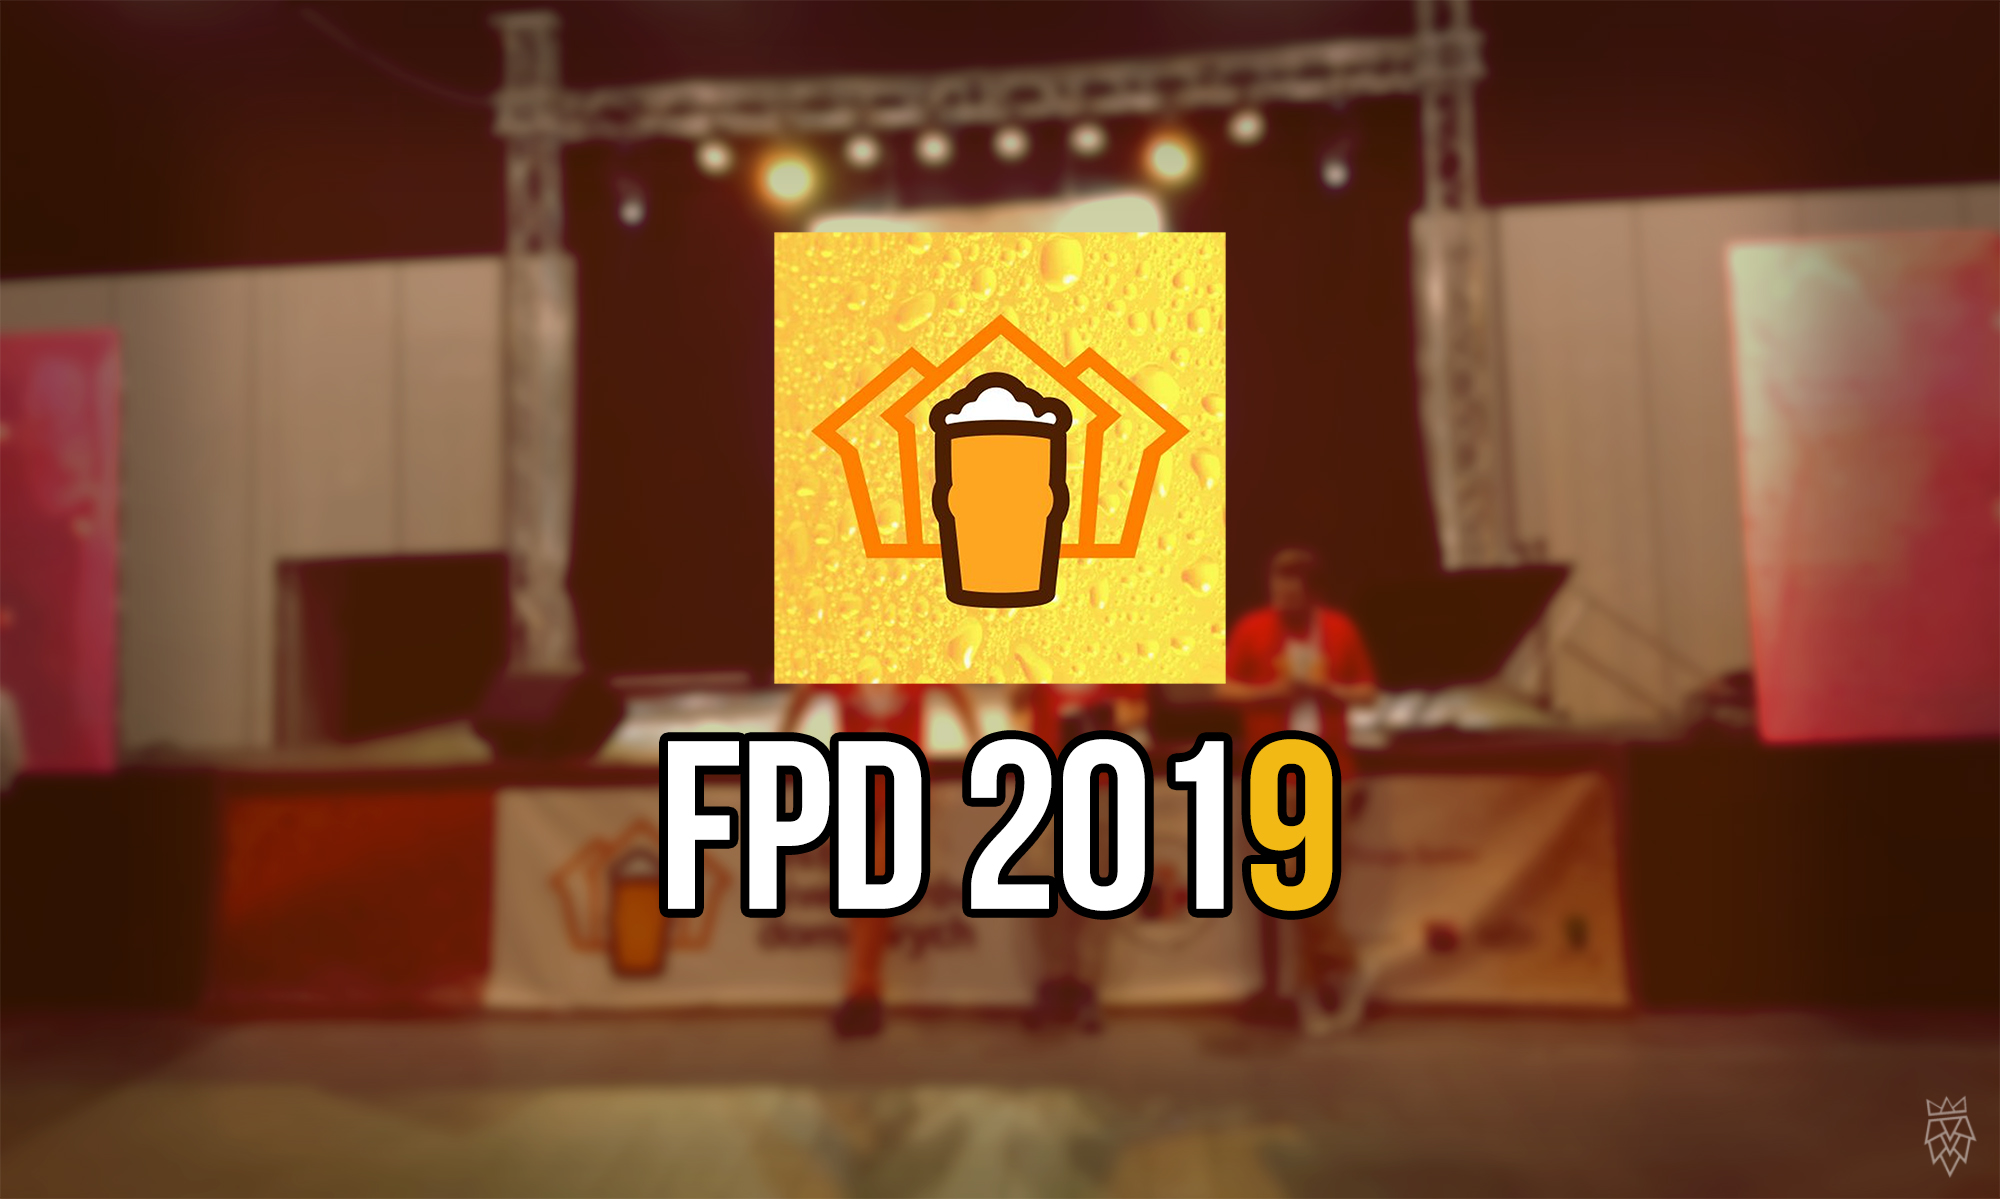 FPD 2019